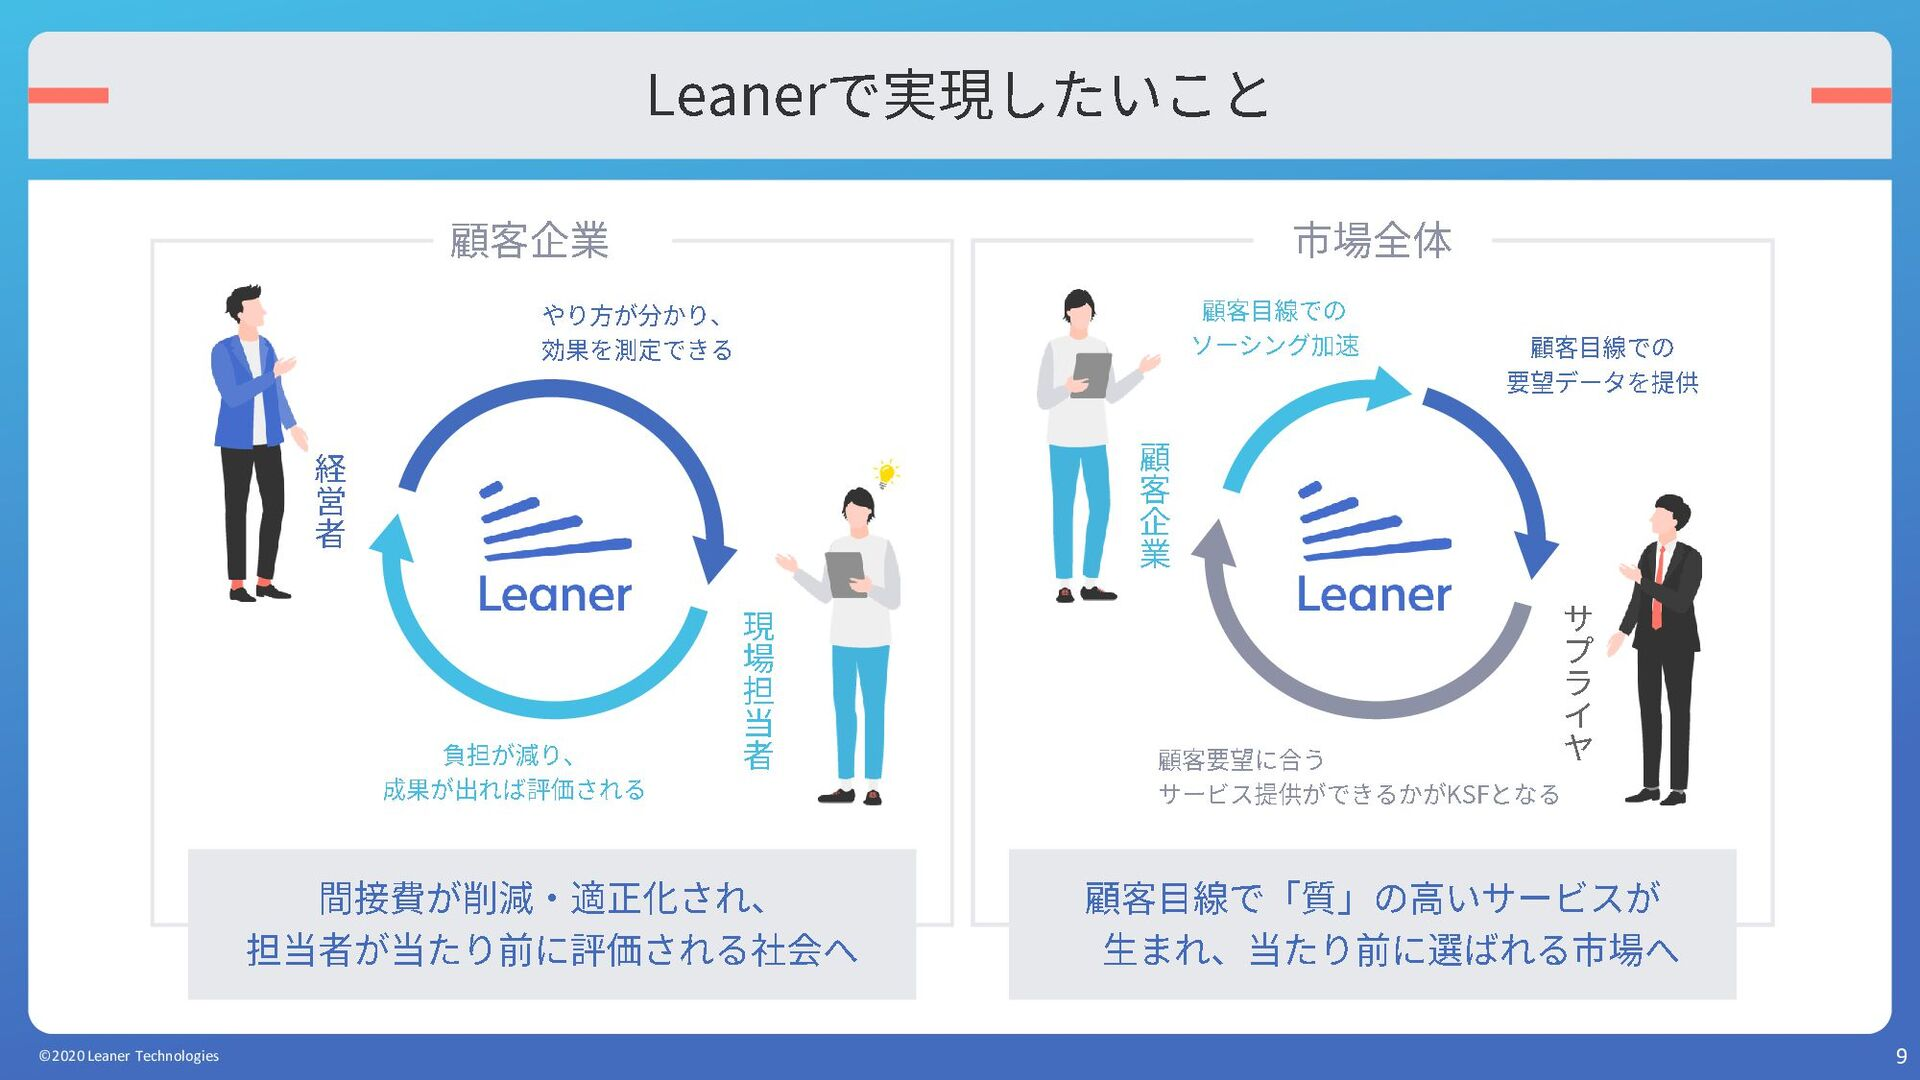 9 Leanerで実現したいこと 間接費が削減・適正化され、 担当者が当たり前に評価される社会...